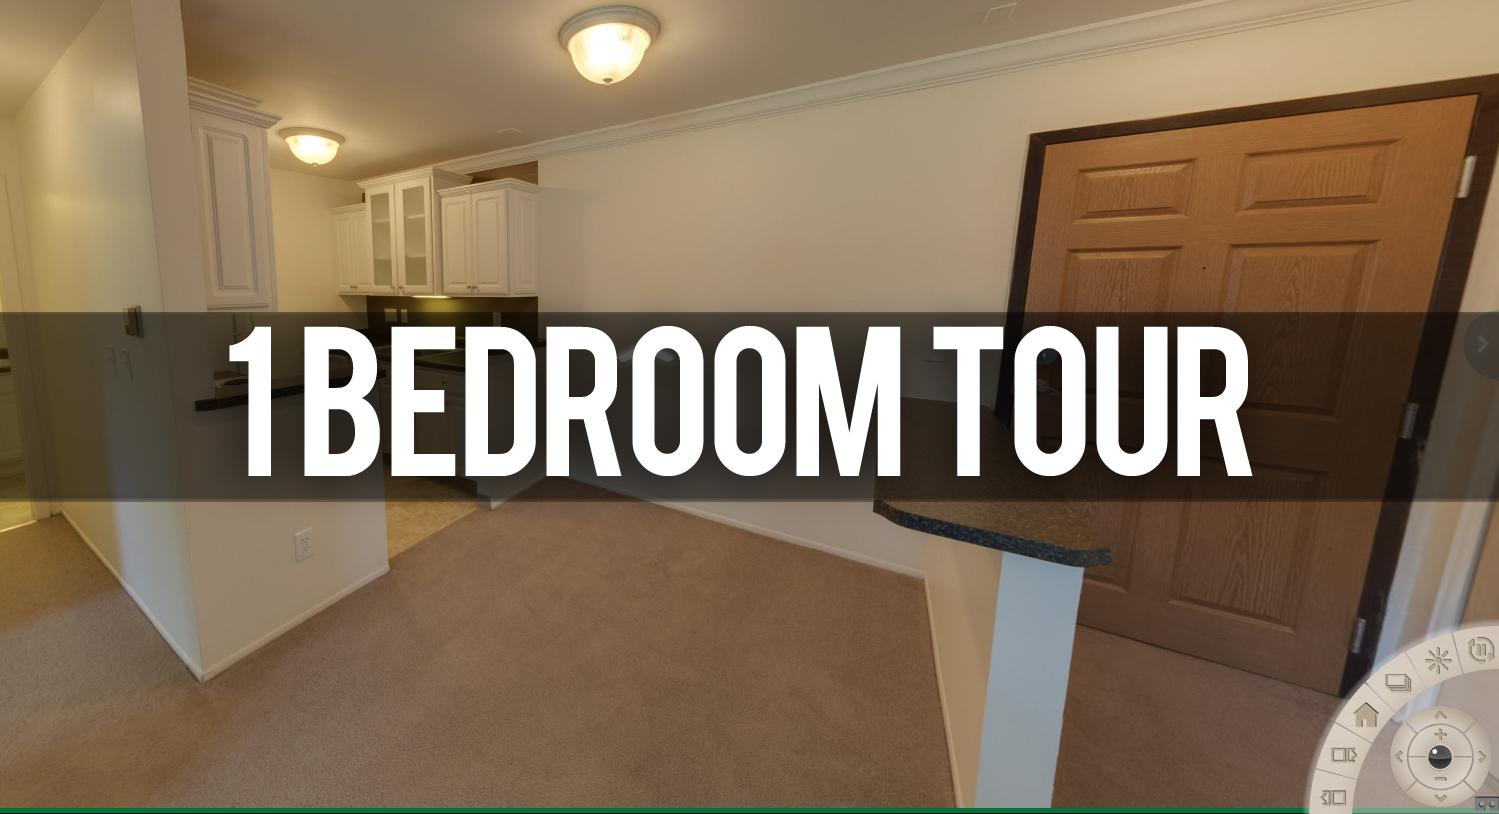 Virtual Tour 1 Bedroom Apartment at Berrytree Apartments in Okemos, MI